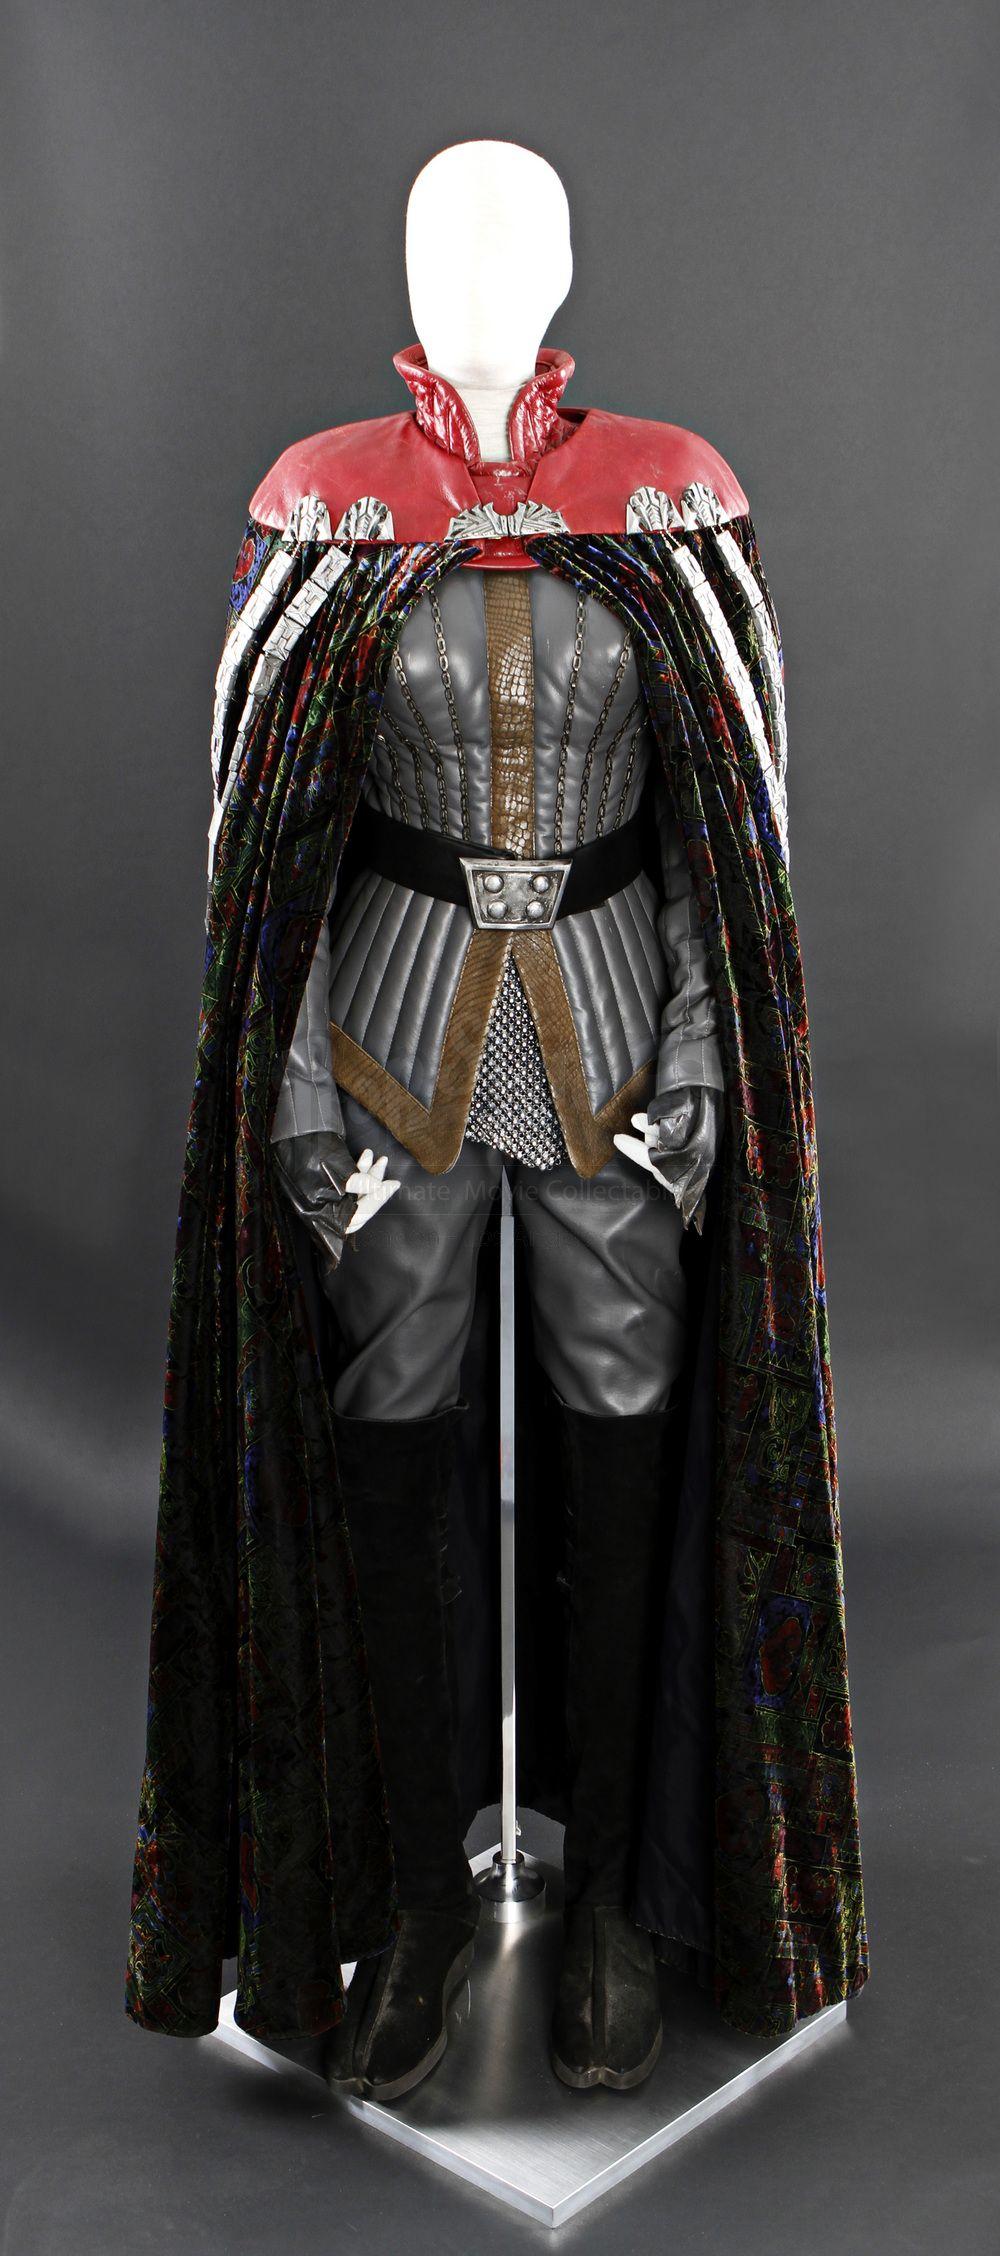 Female Klingon Costume  Prop Store - Ultimate Movie -3537